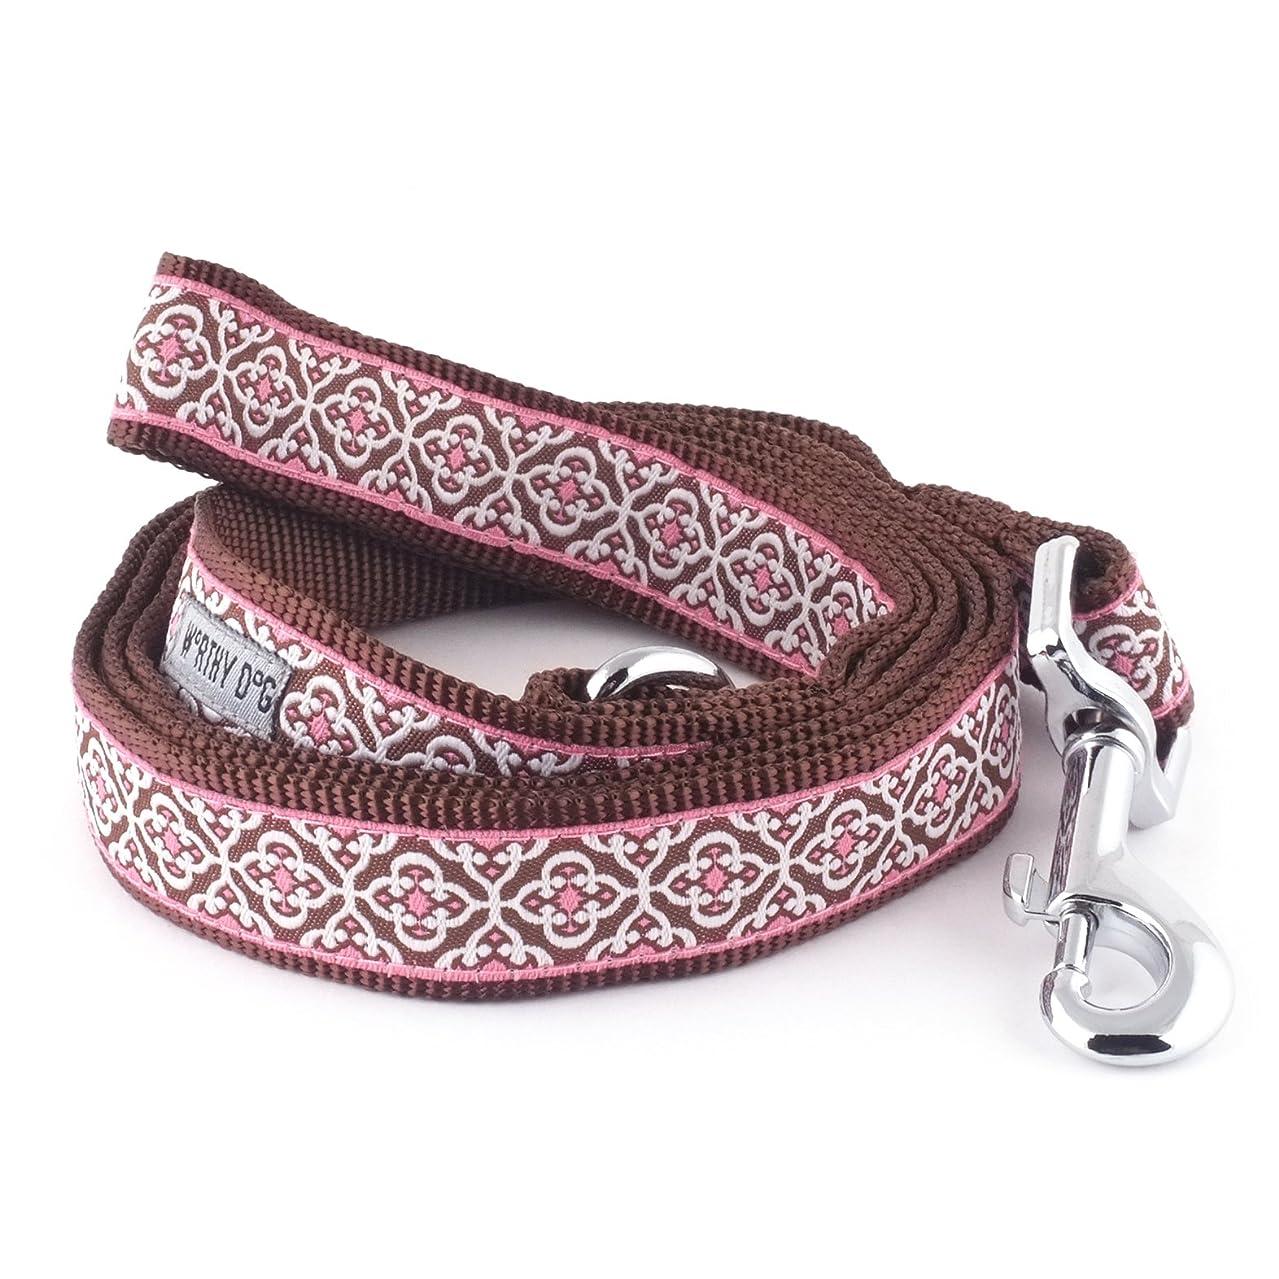 The Worthy Dog   Knightsbridge Pink Lead  Designer Pet Dog Leash , Pink, 1